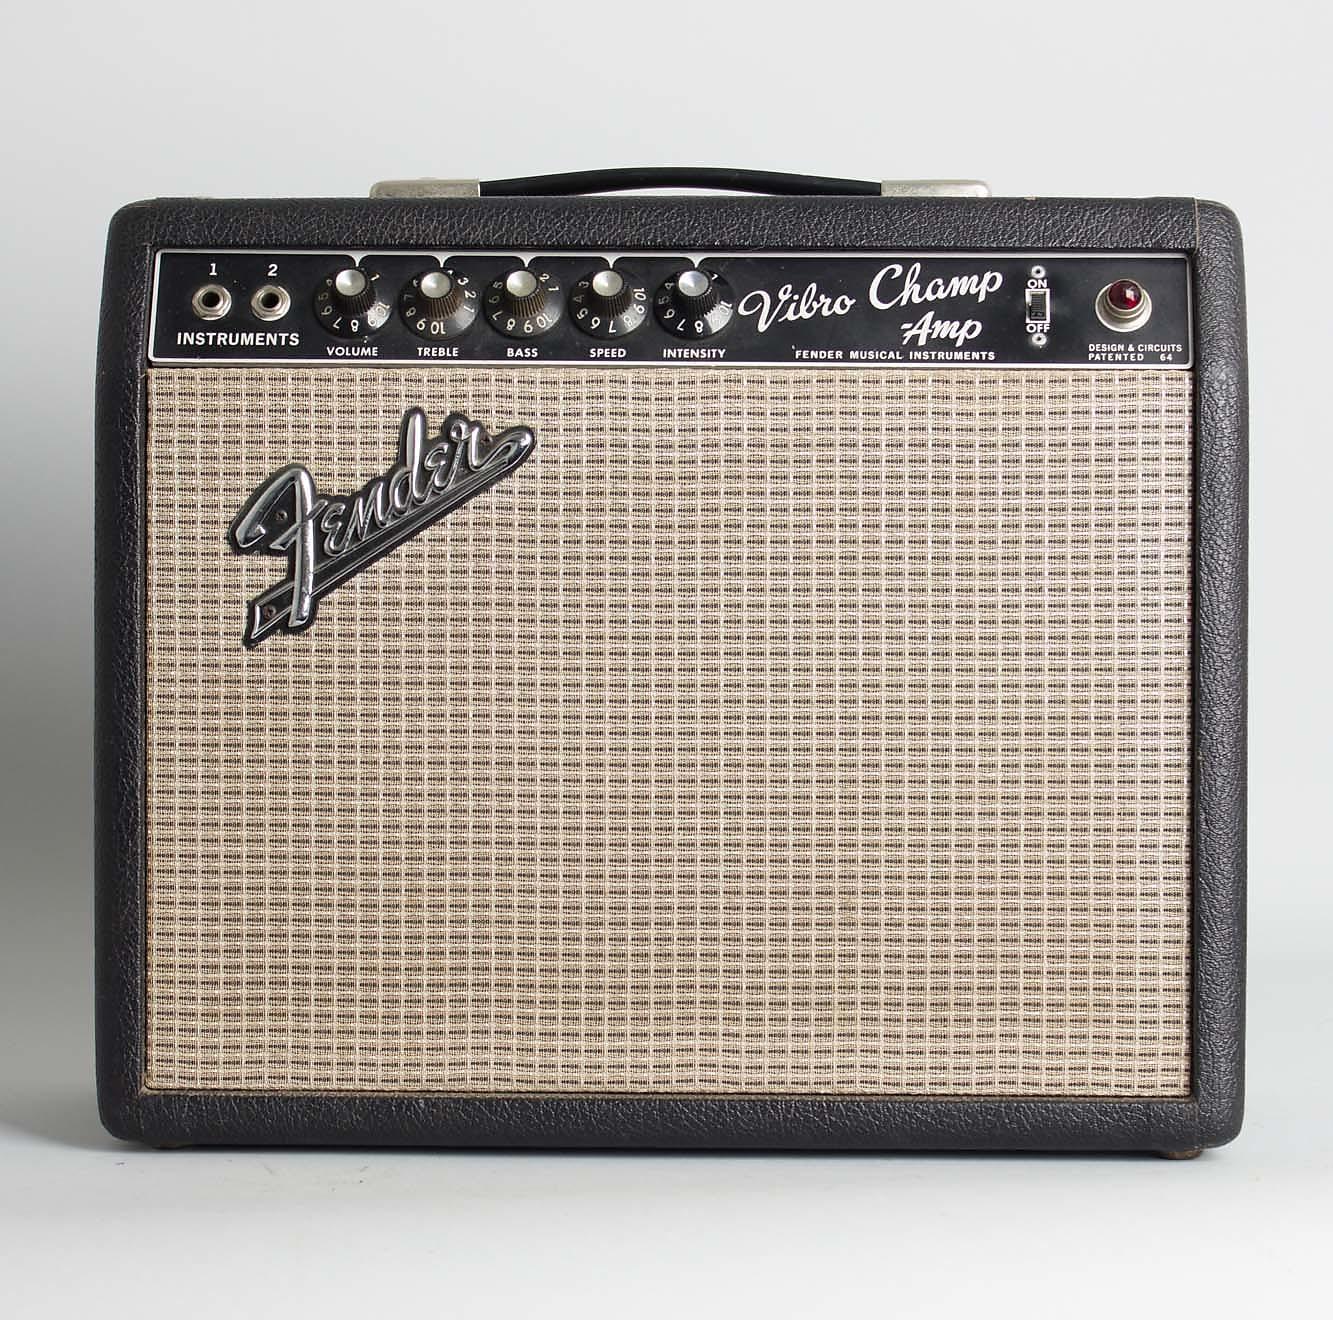 Fender  Vibro-Champ AA764 Tube Amplifier (1967), ser. #A-17691.